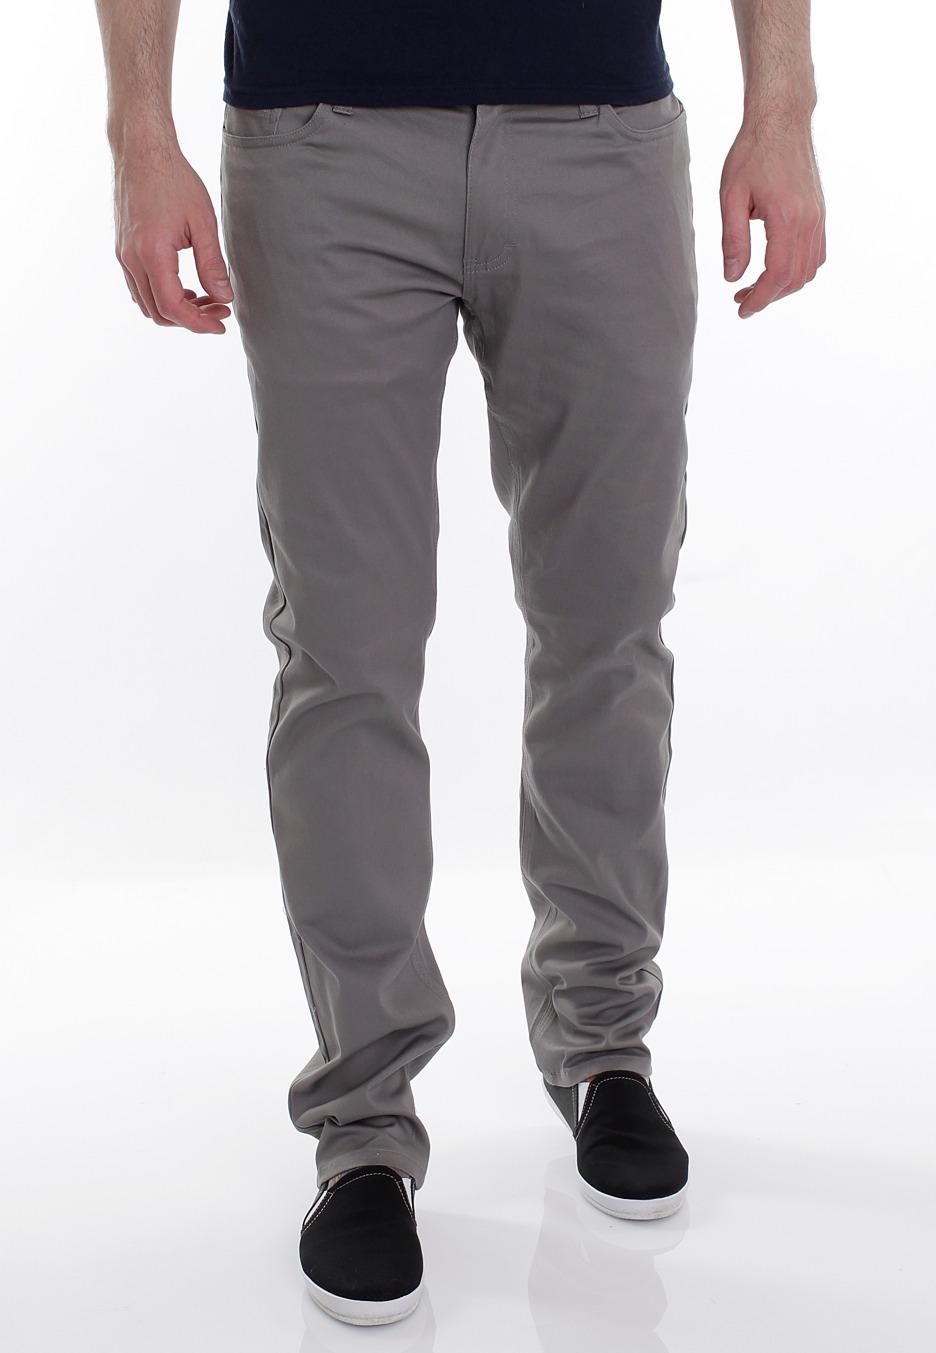 Emerica - HSU Saratoga Twill Grey - Pants - Streetwear Shop ...